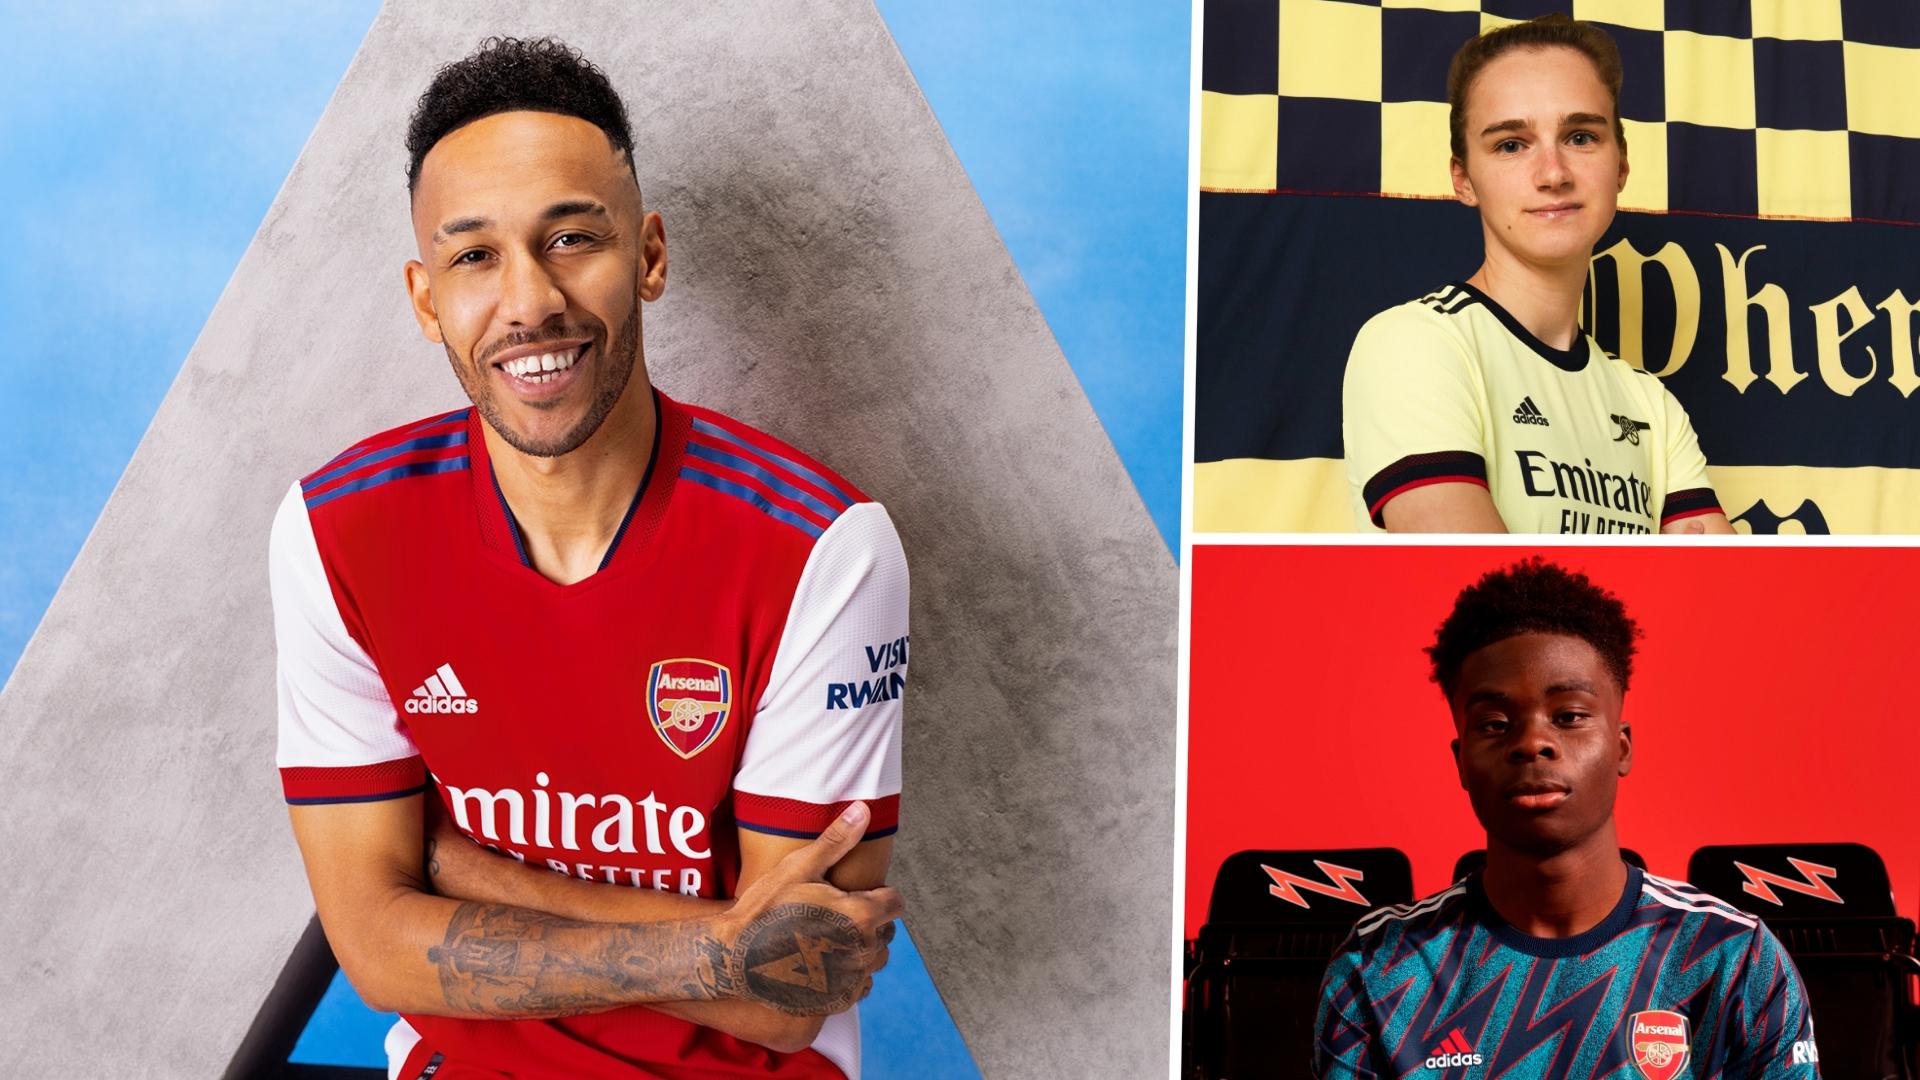 arsenal-2021-2022-kits-and-logo-dream-league-soccer-2021-kits